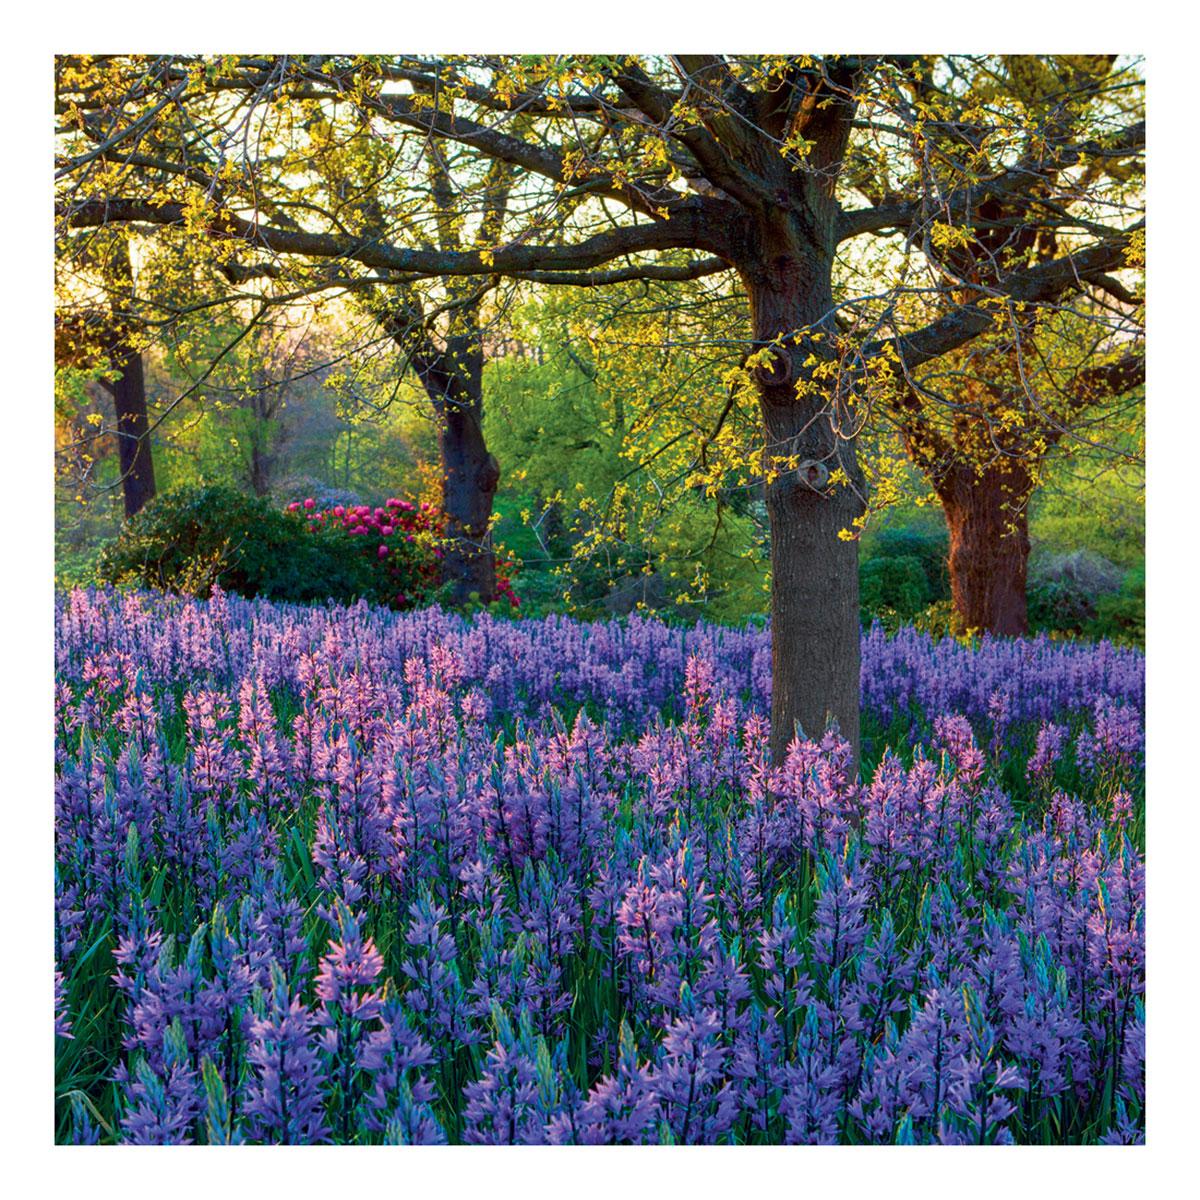 BBC Gardeners' World - Meadow of Camassia Greeting Card